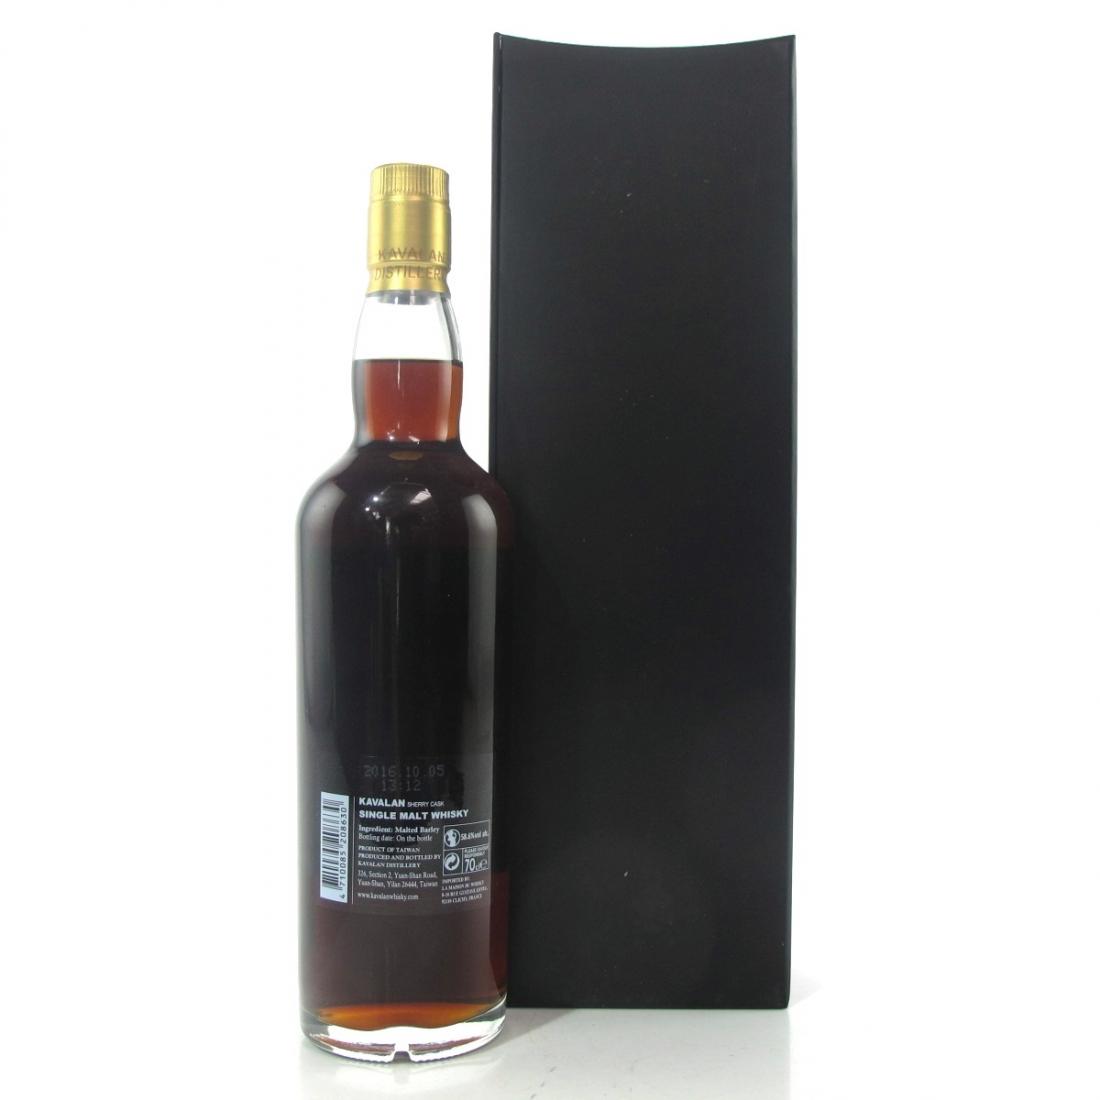 Kavalan Selection Sherry Cask / LMDW